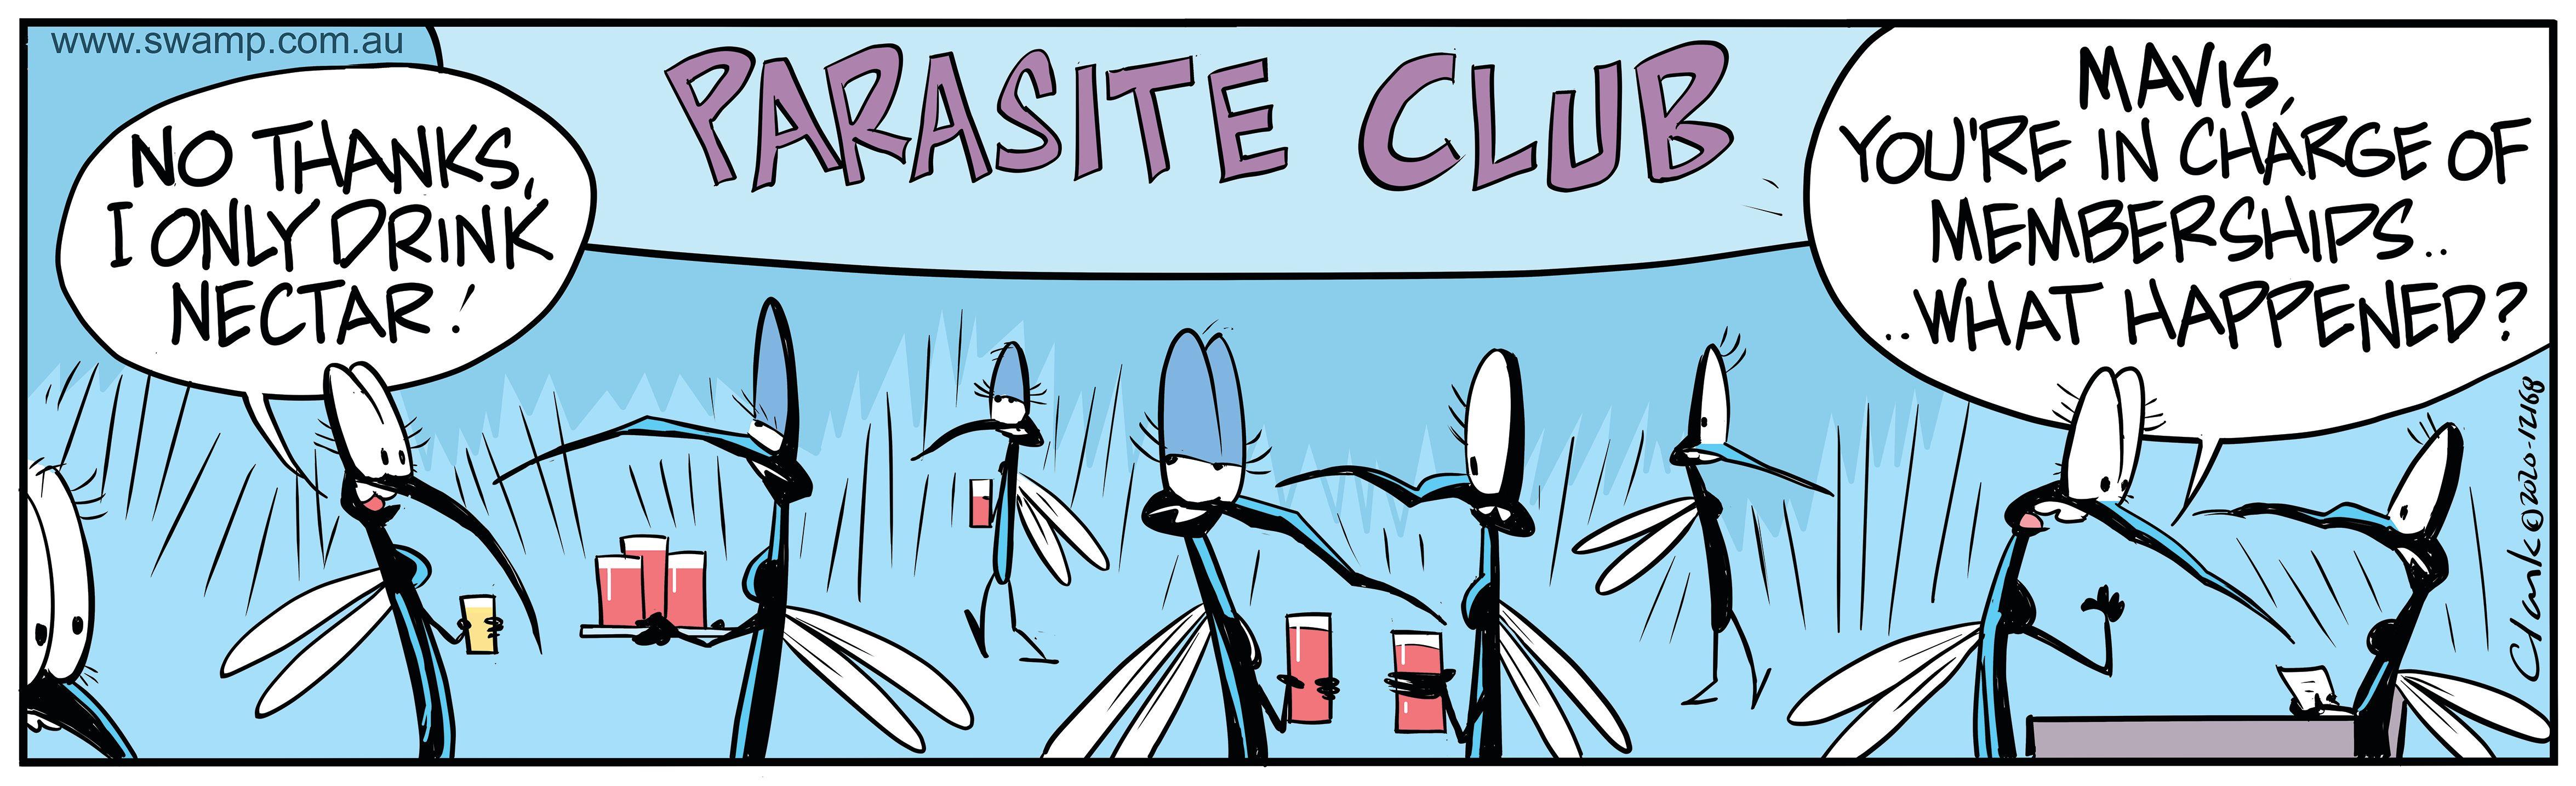 Parasites Membership